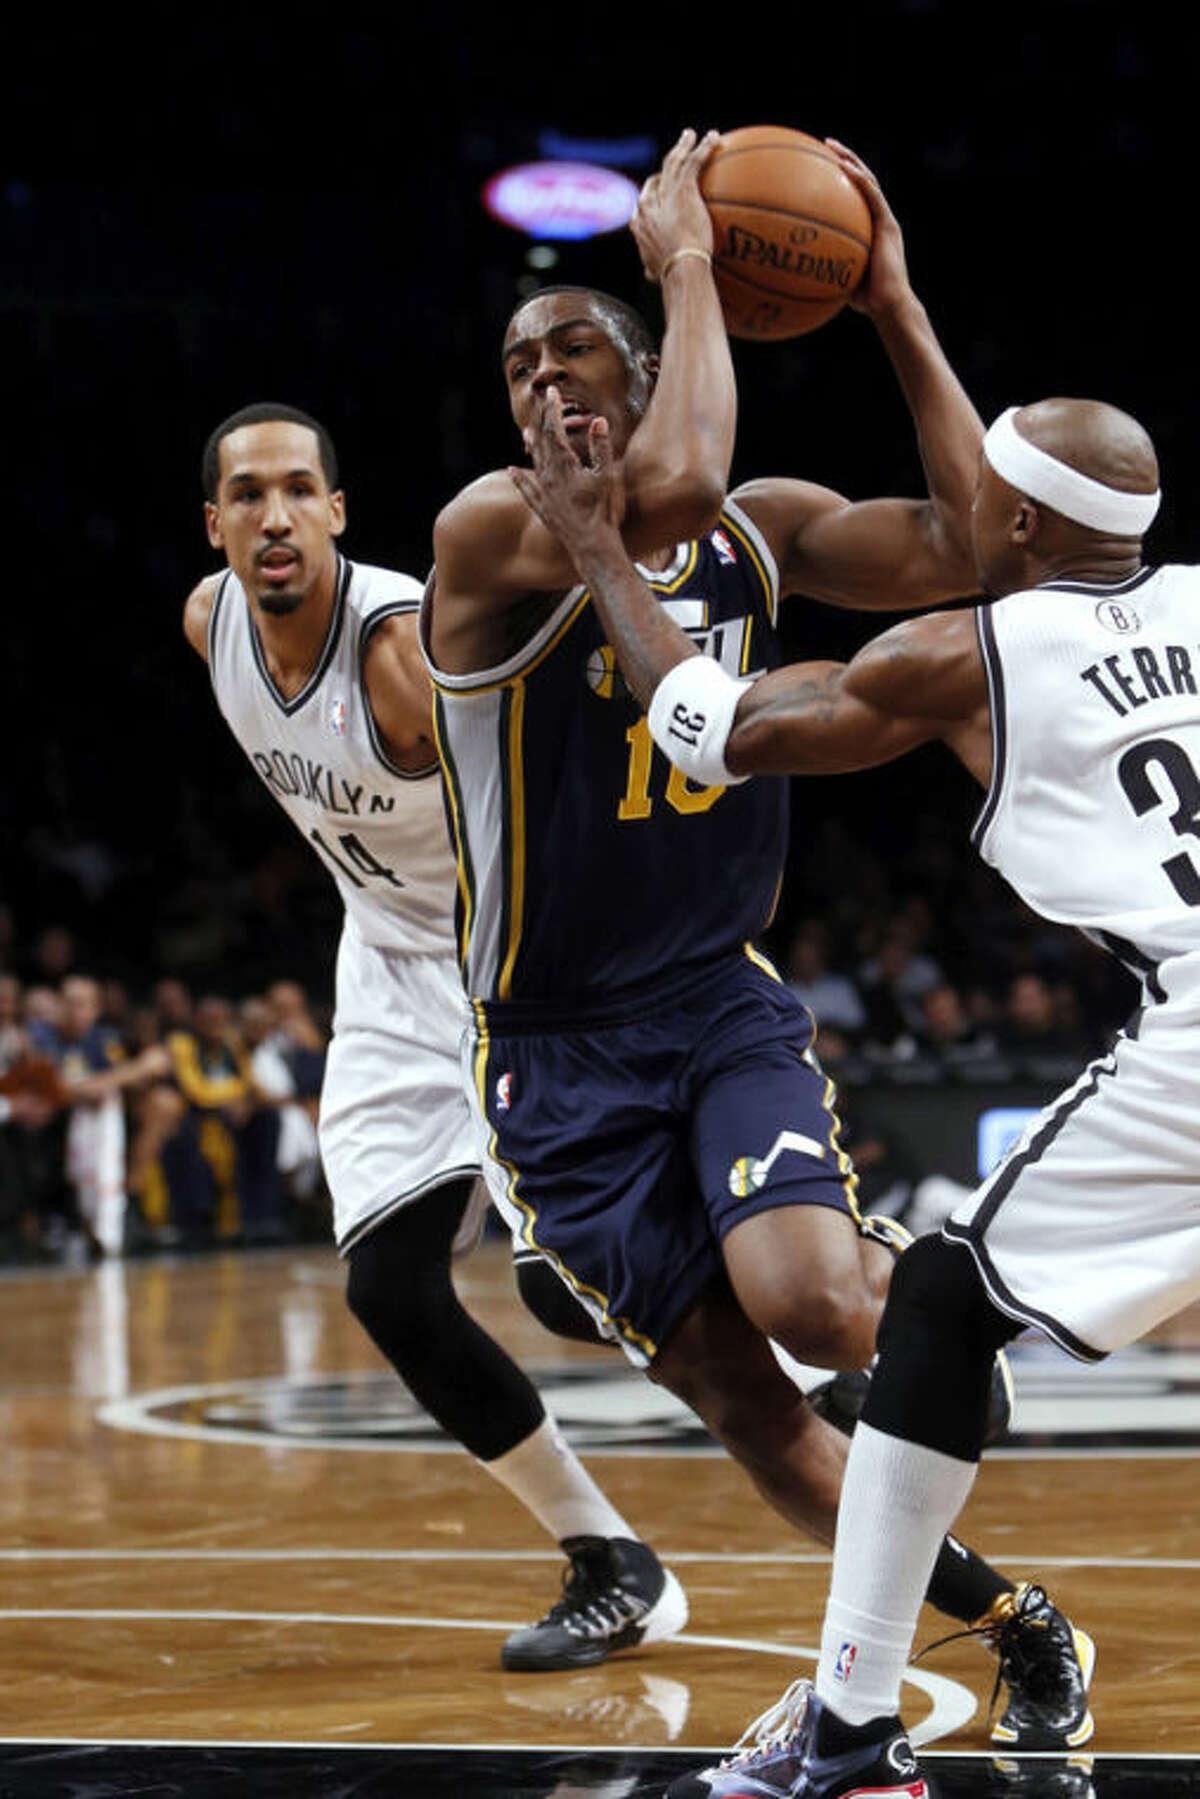 Utah Jazz's Alec Burks (10) drives between Brooklyn Nets' Shaun Livingston, left, and Jason Terry during the first half of an NBA basketball game Tuesday, Nov. 5, 2013, in New York. (AP Photo/Jason DeCrow)